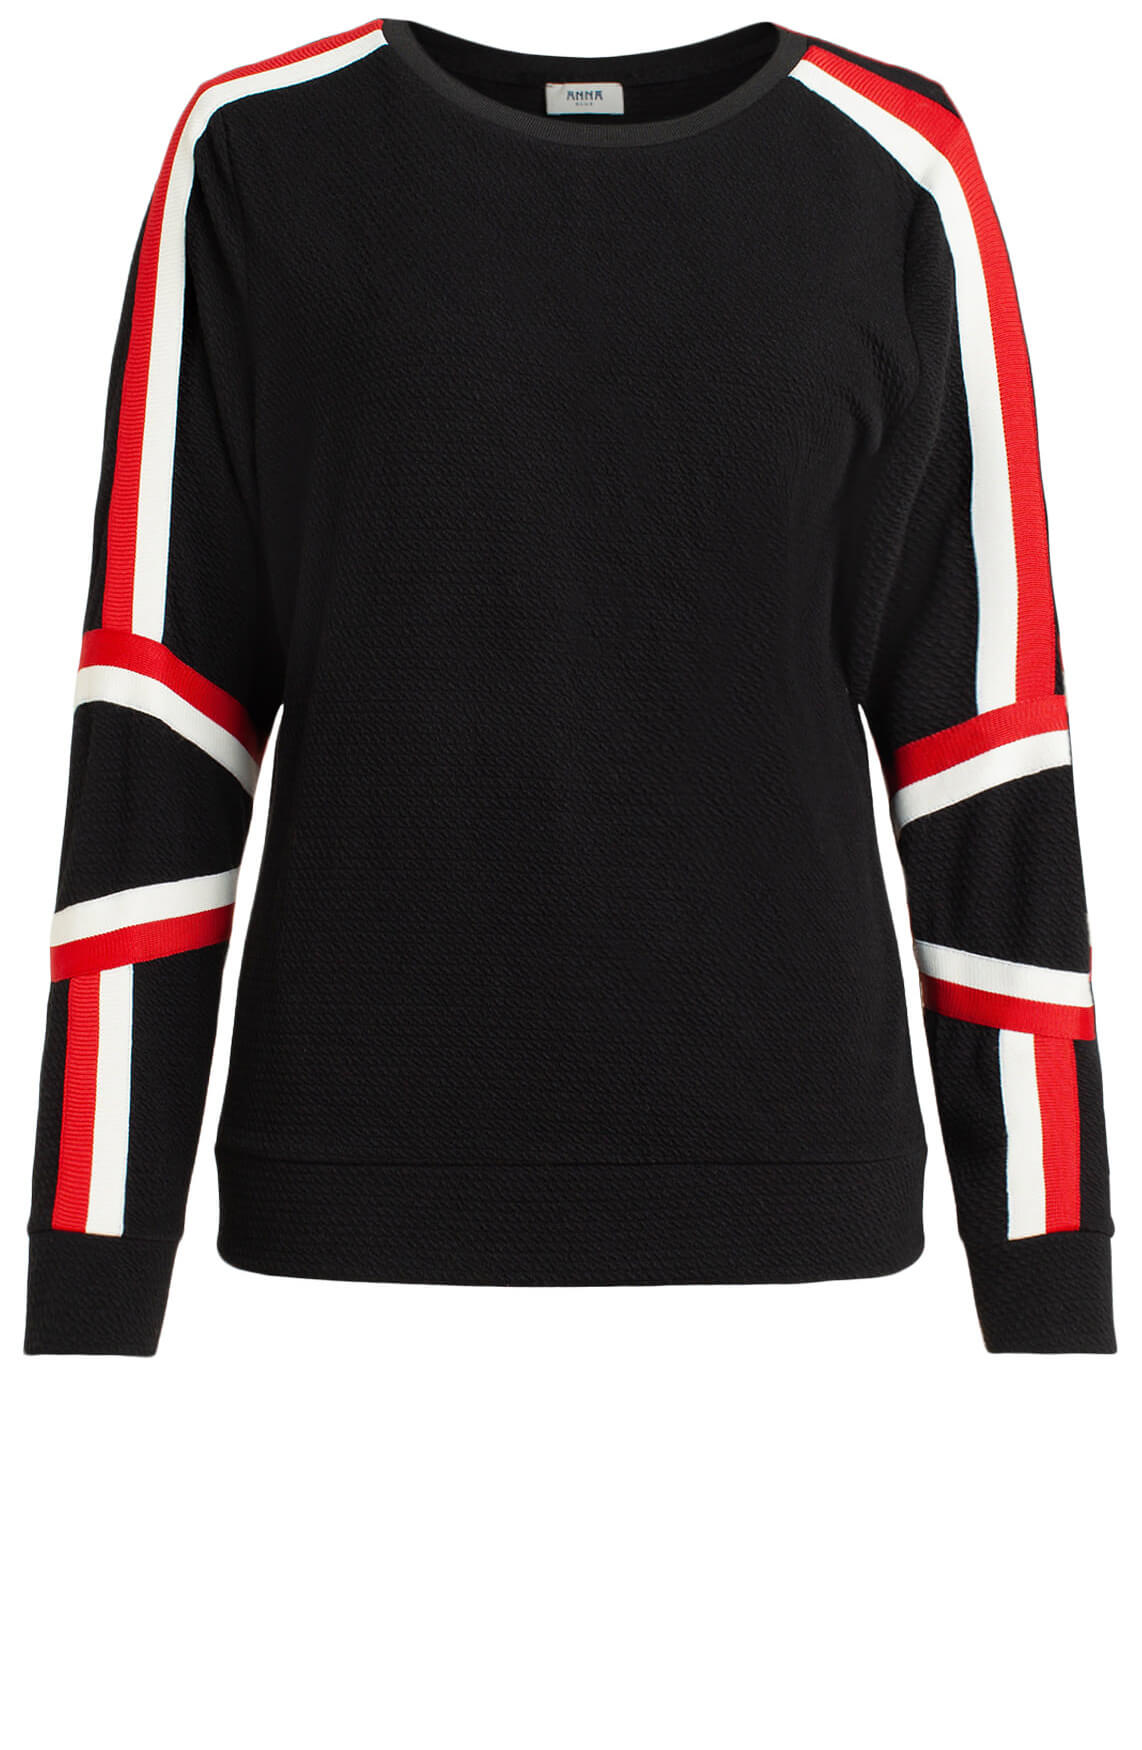 Anna Blue Dames Sweater met contrasterende bies zwart